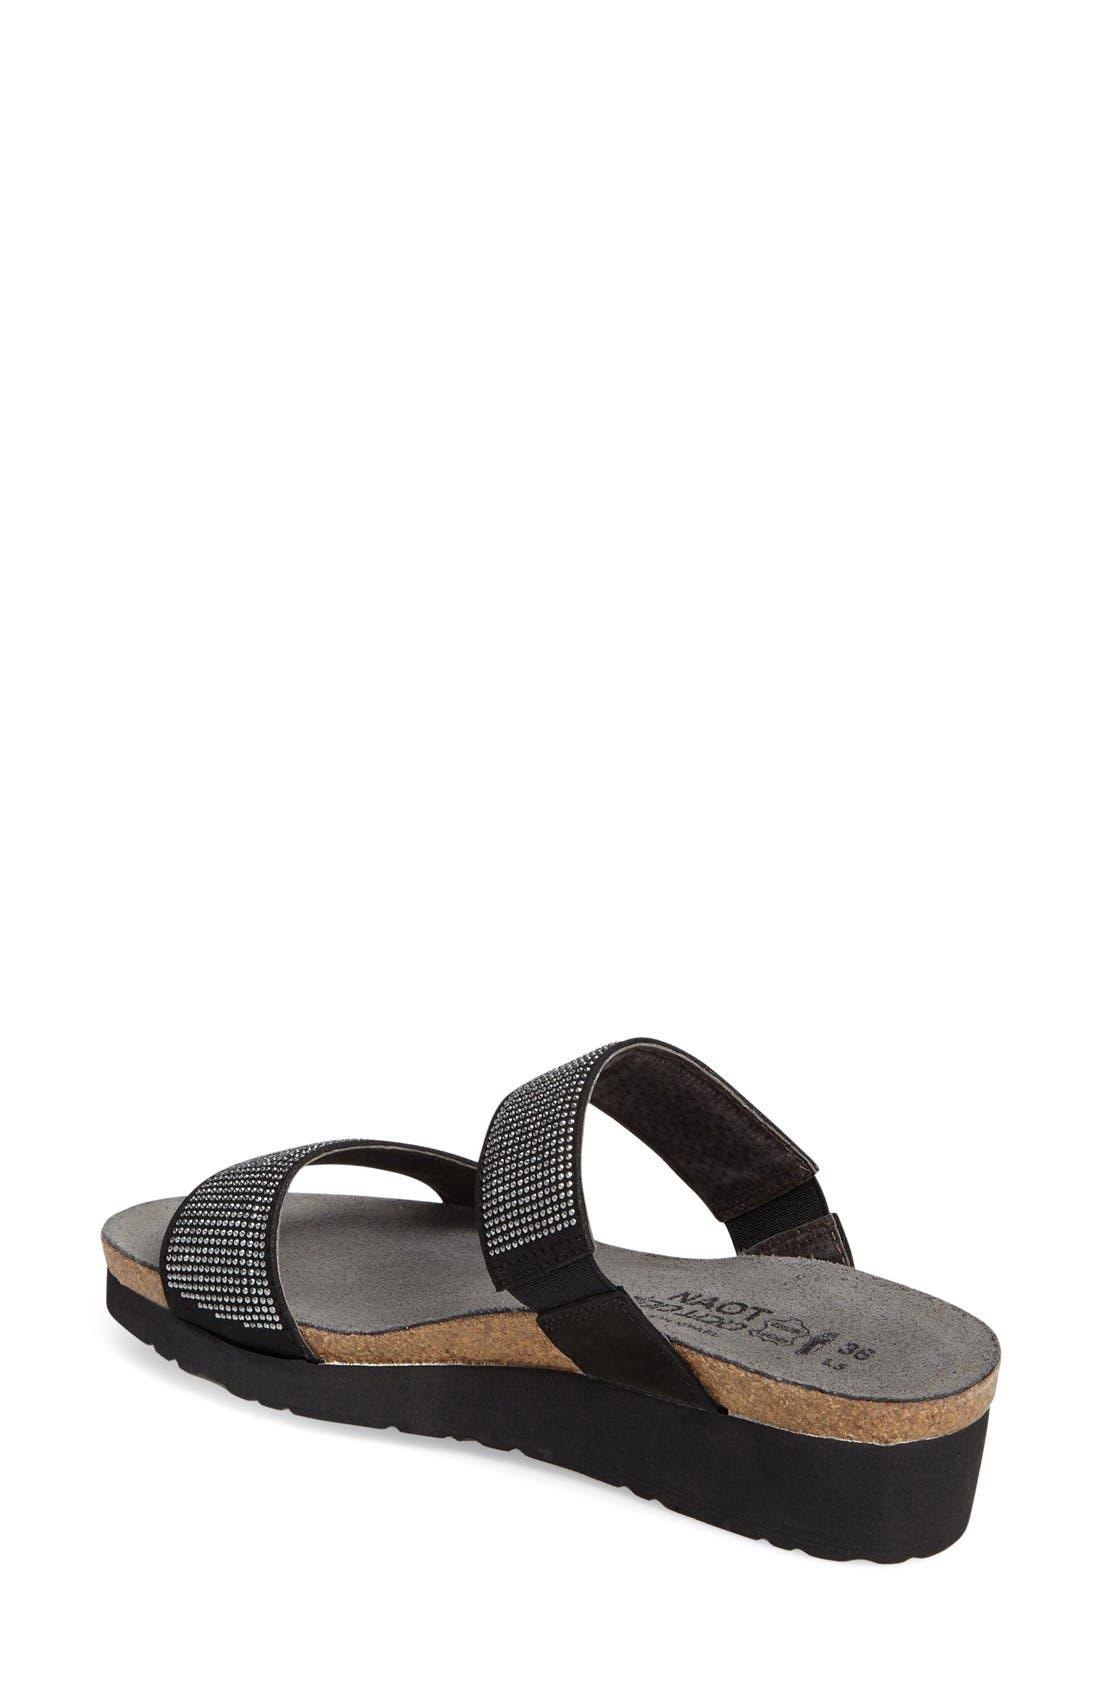 'Bianca' Slide Sandal,                             Alternate thumbnail 5, color,                             BLACK LEATHER